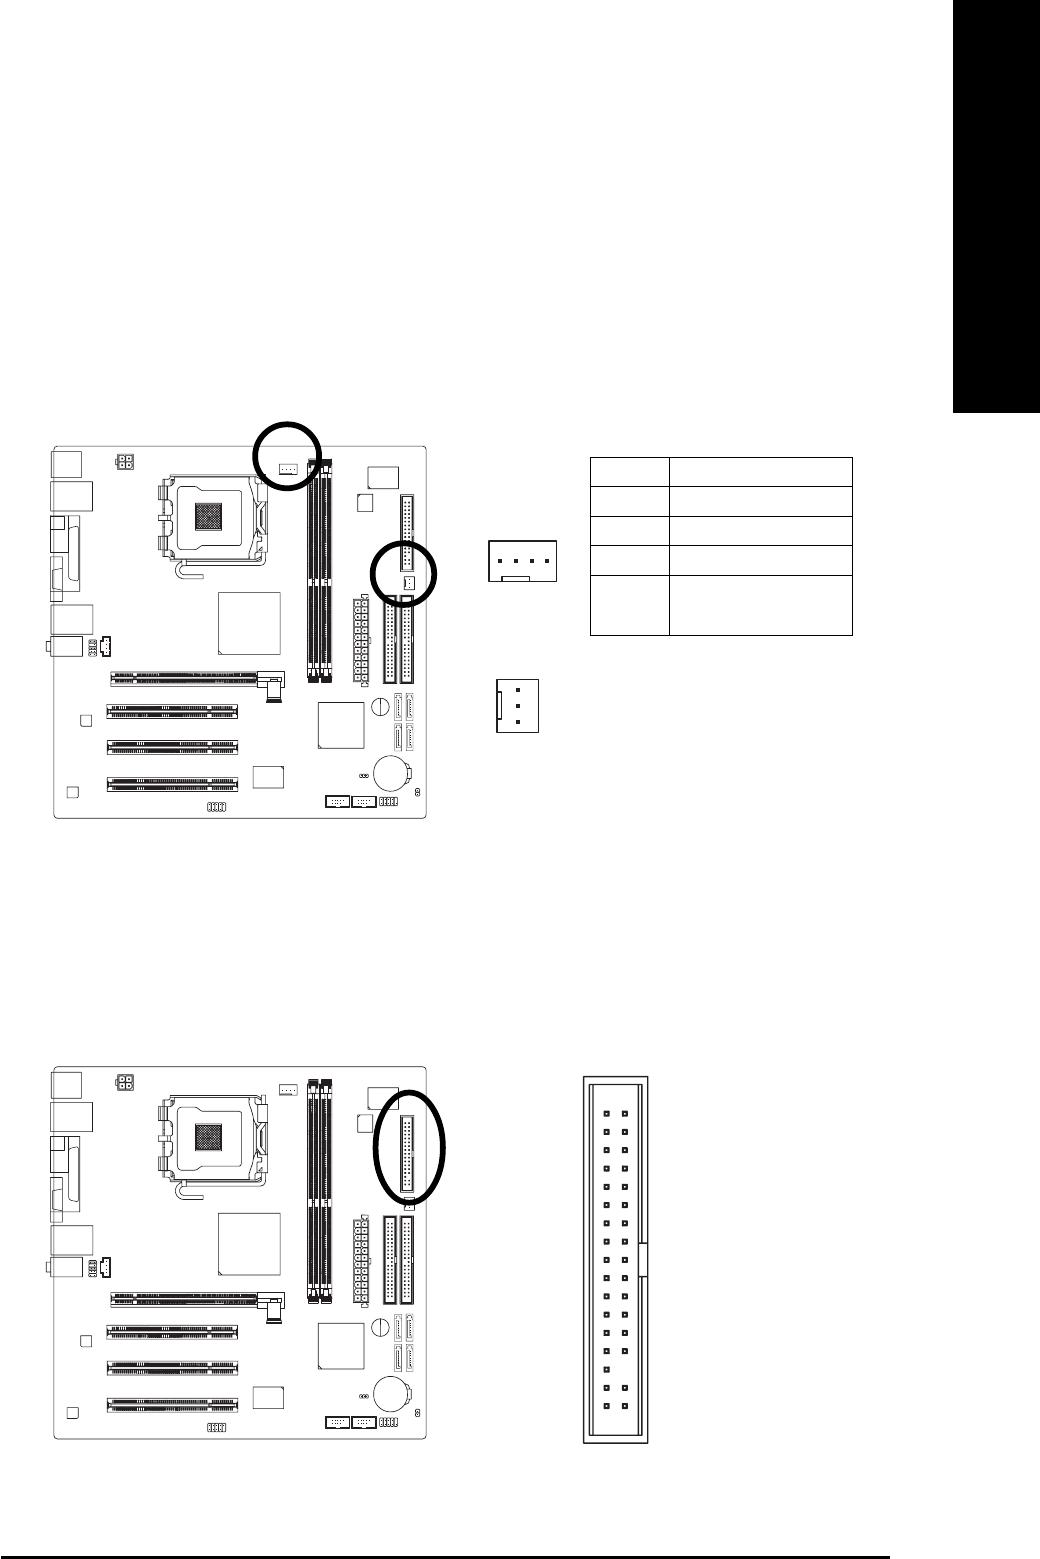 Fujitsu ga-8s649mf specs, pricing, reviews, & support.